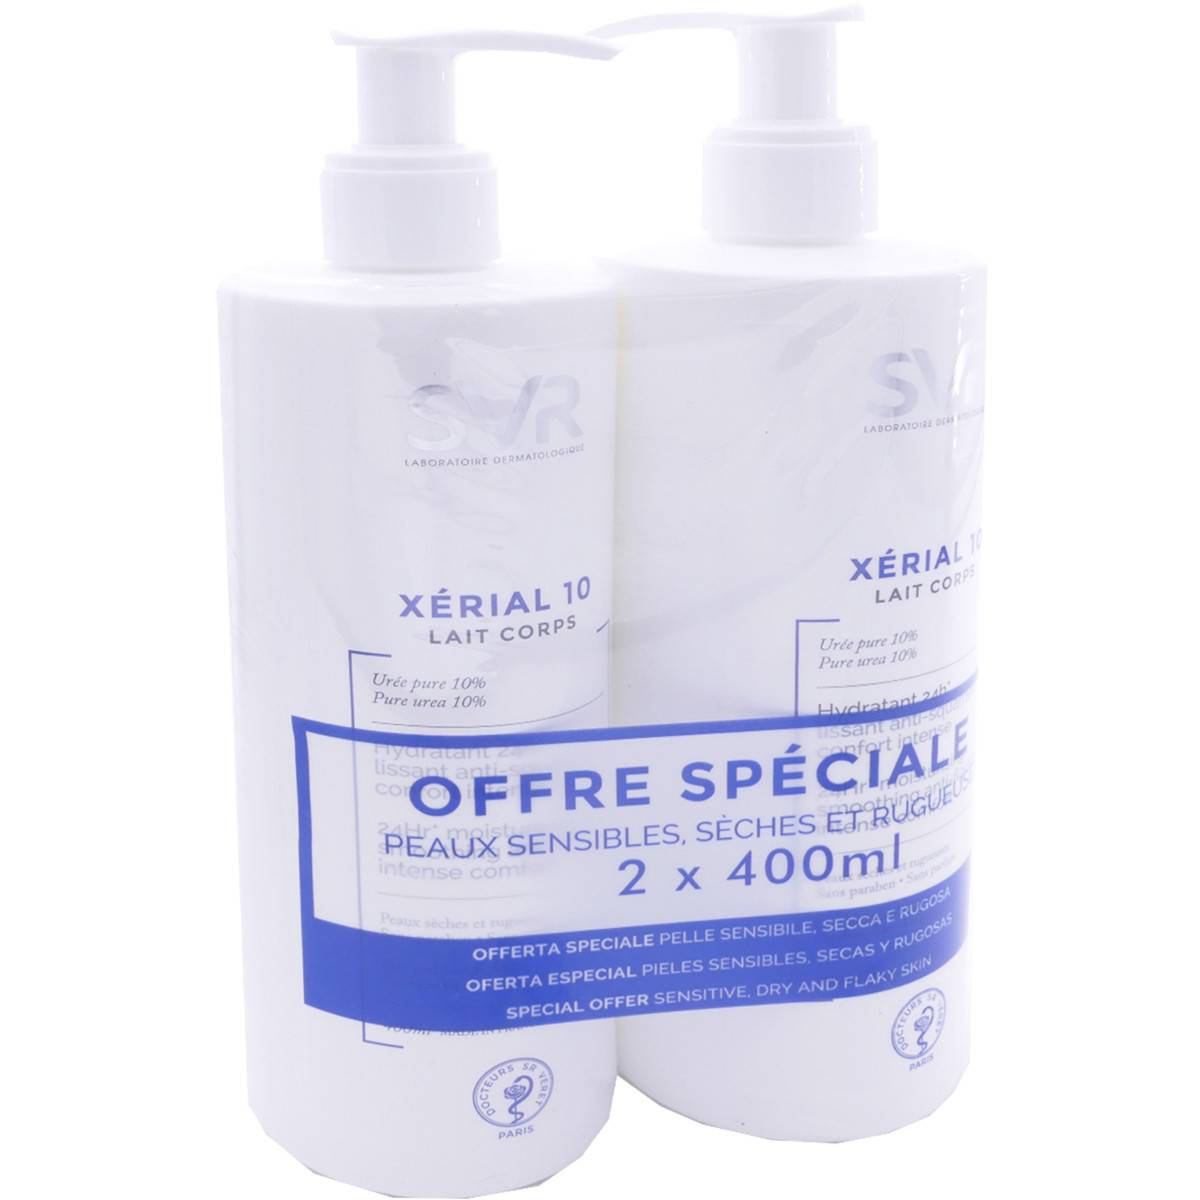 Svr xerial 10 lait corps 2x 400 ml